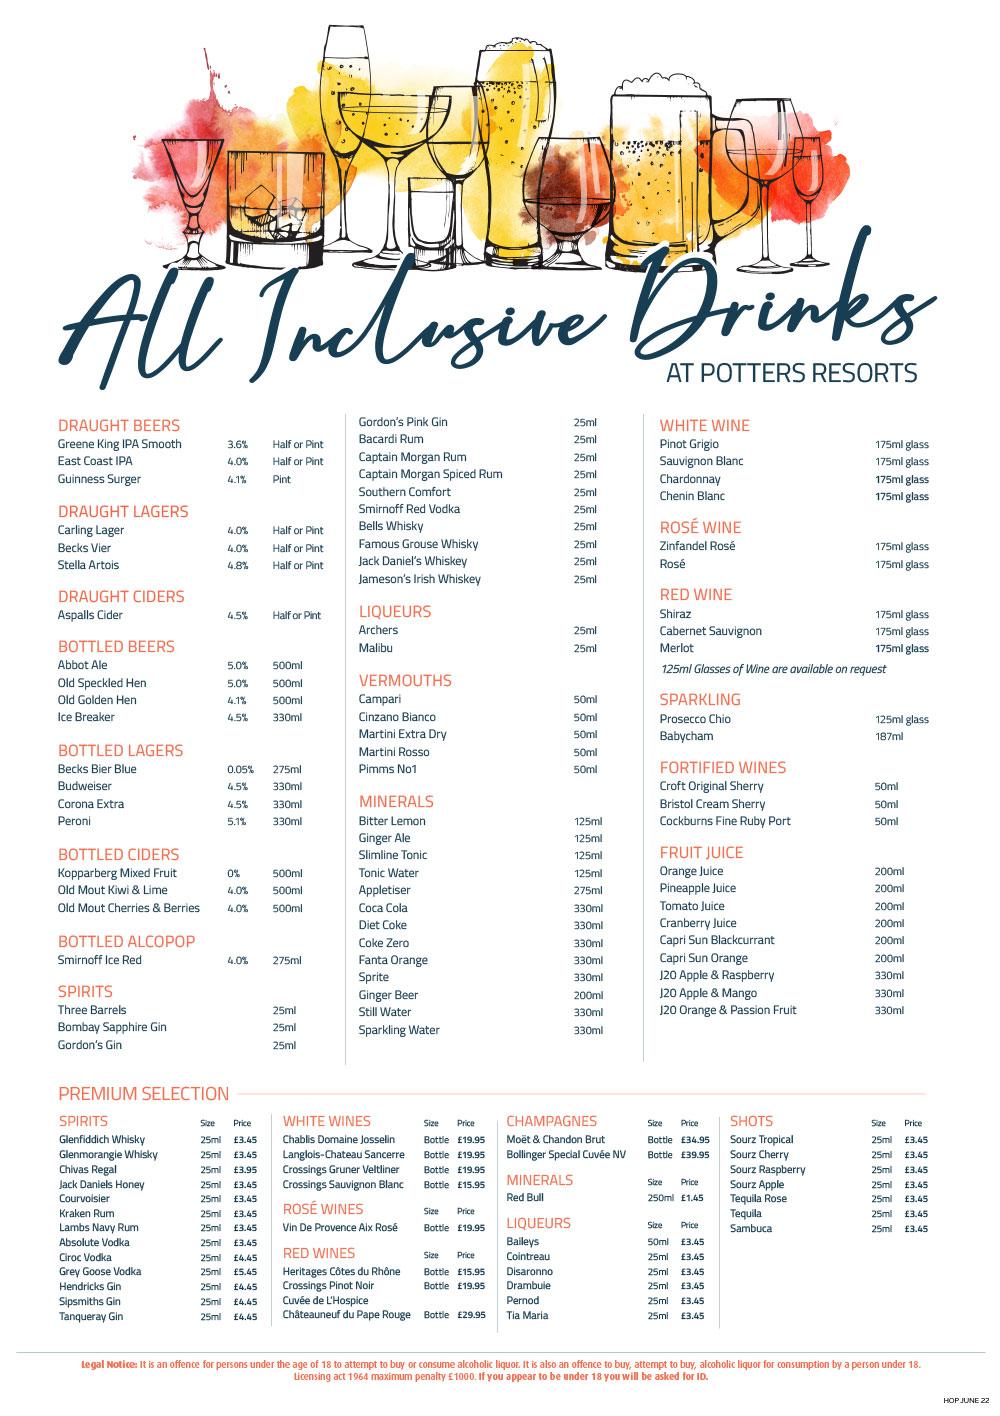 All Inclusive Drinks Menu - Potters Resort